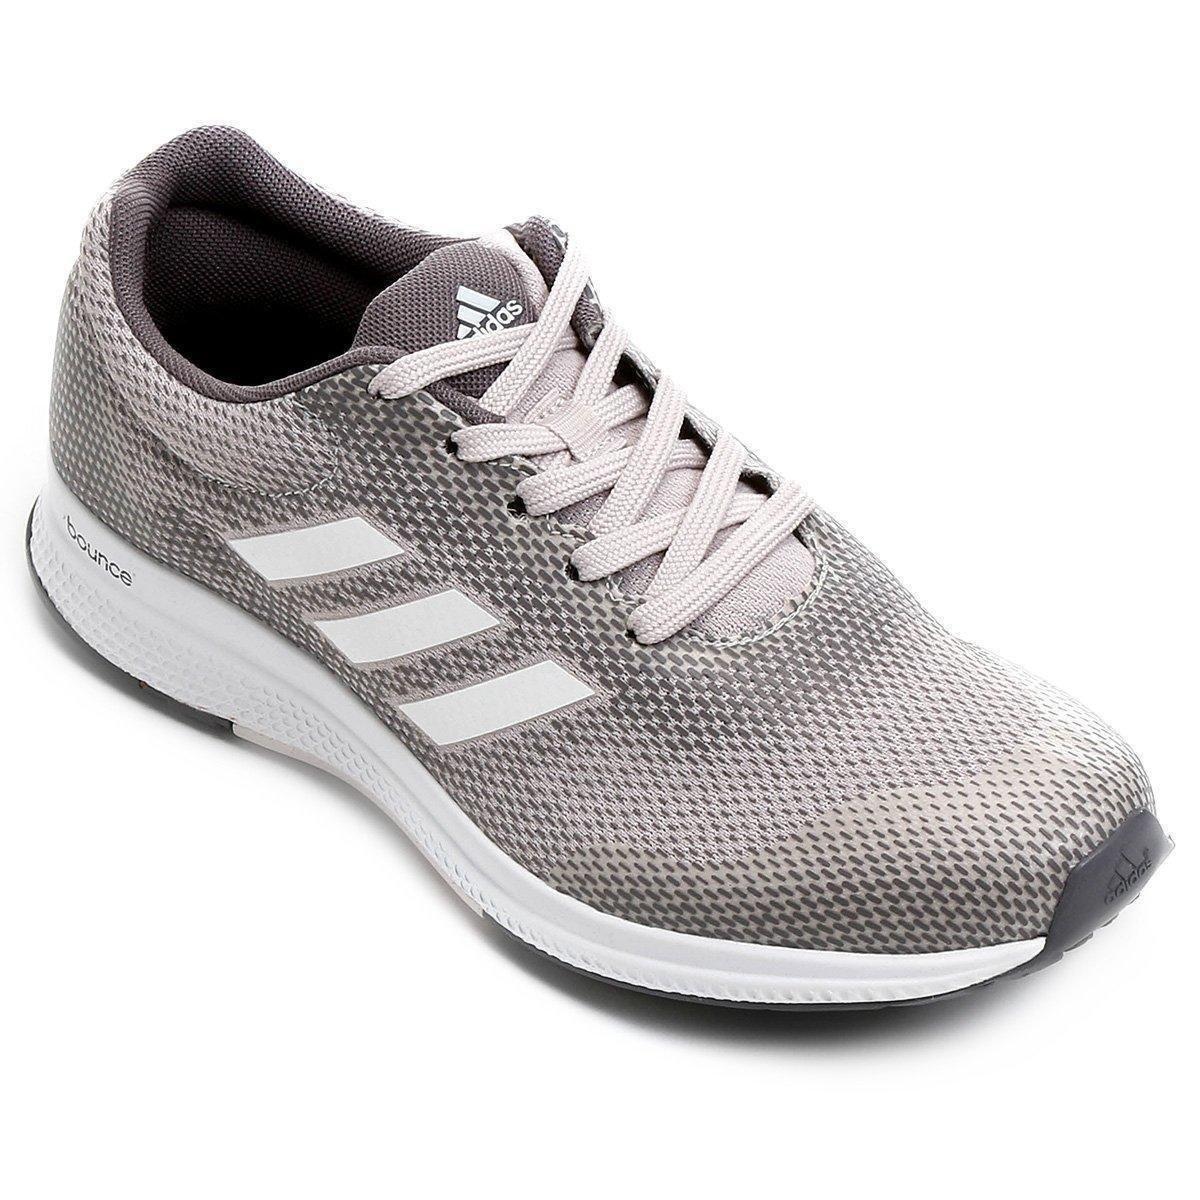 2ba444a2bfeda Tênis Adidas Mana Bounce 2 Feminino - Rosa Claro - Compre Agora ...